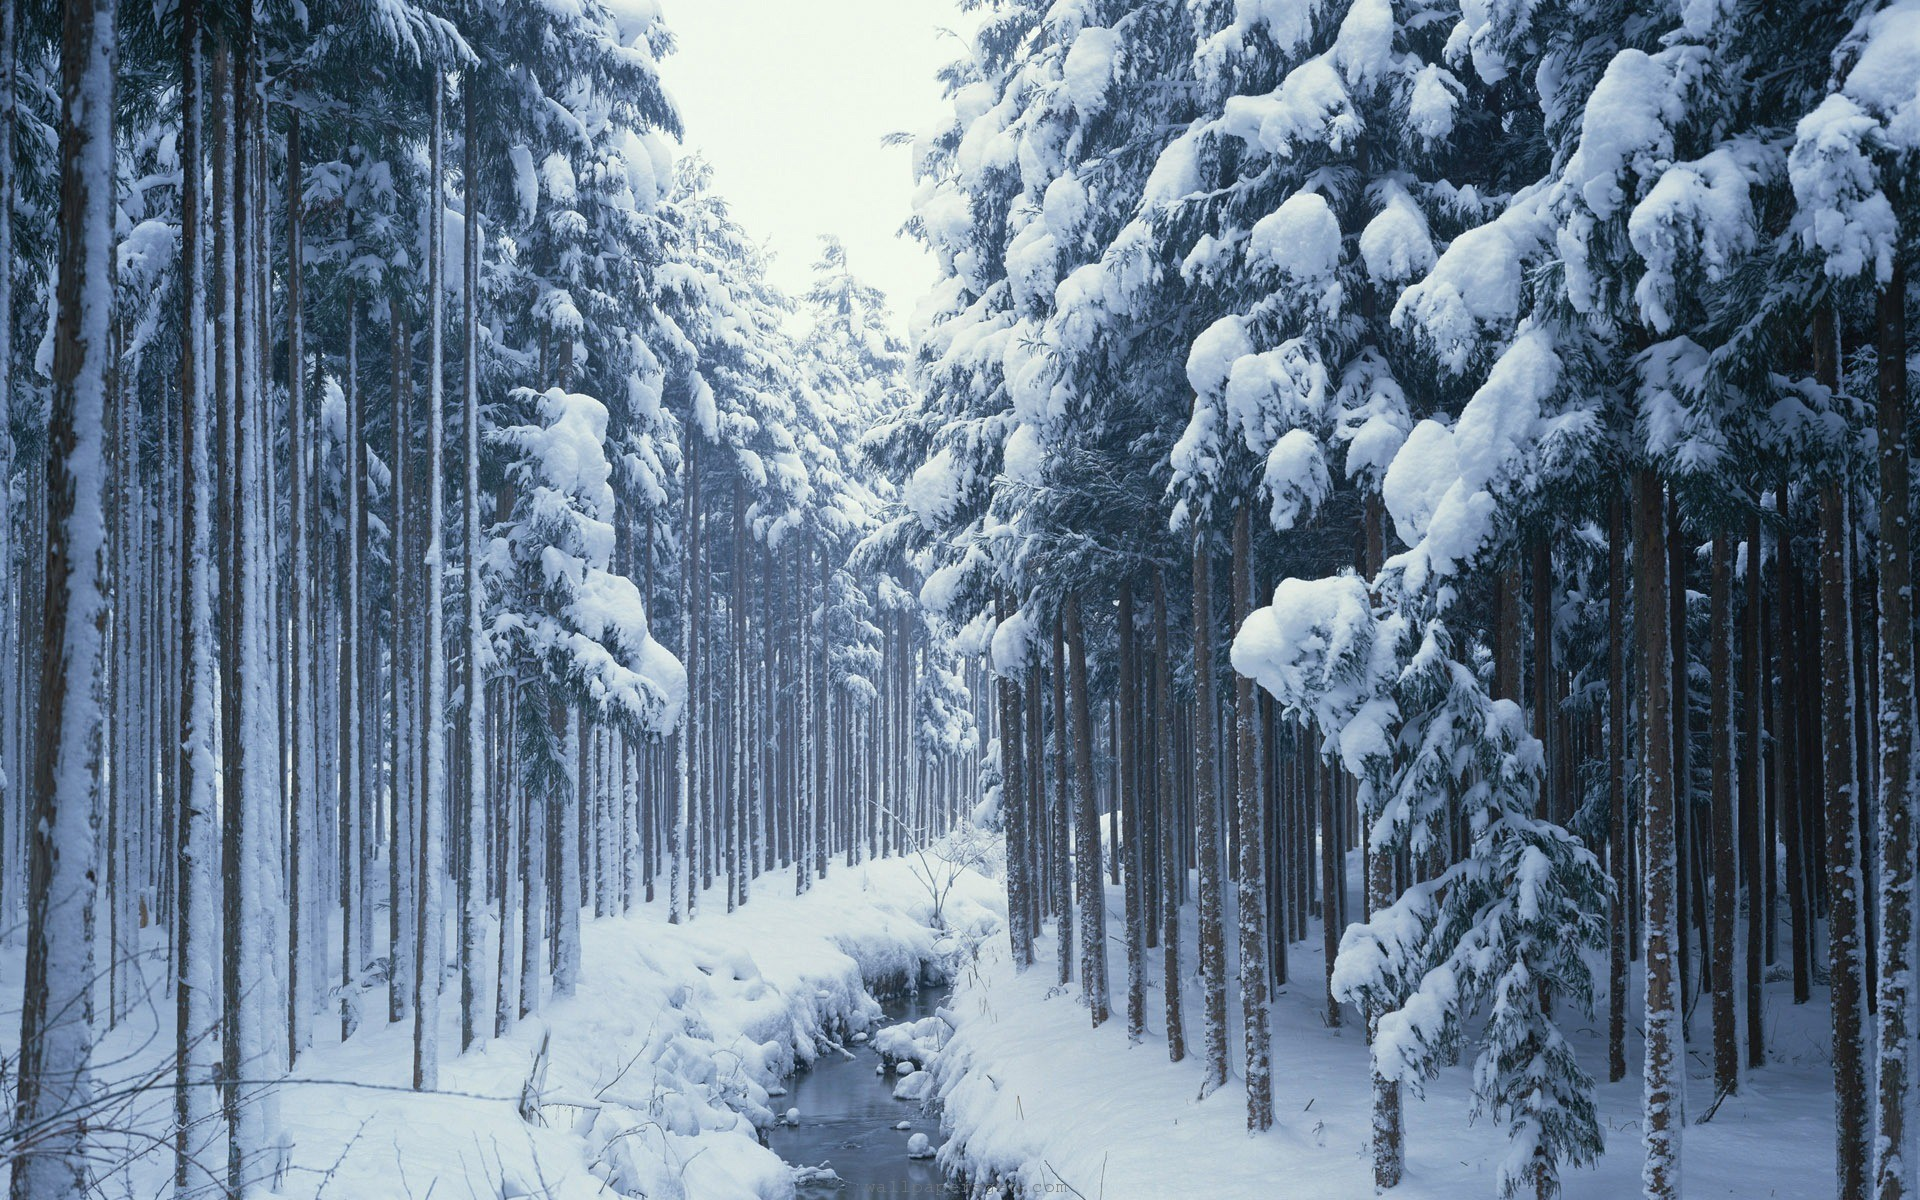 landscape winter wallpaper river forest widescreen Glisse en 1920x1200